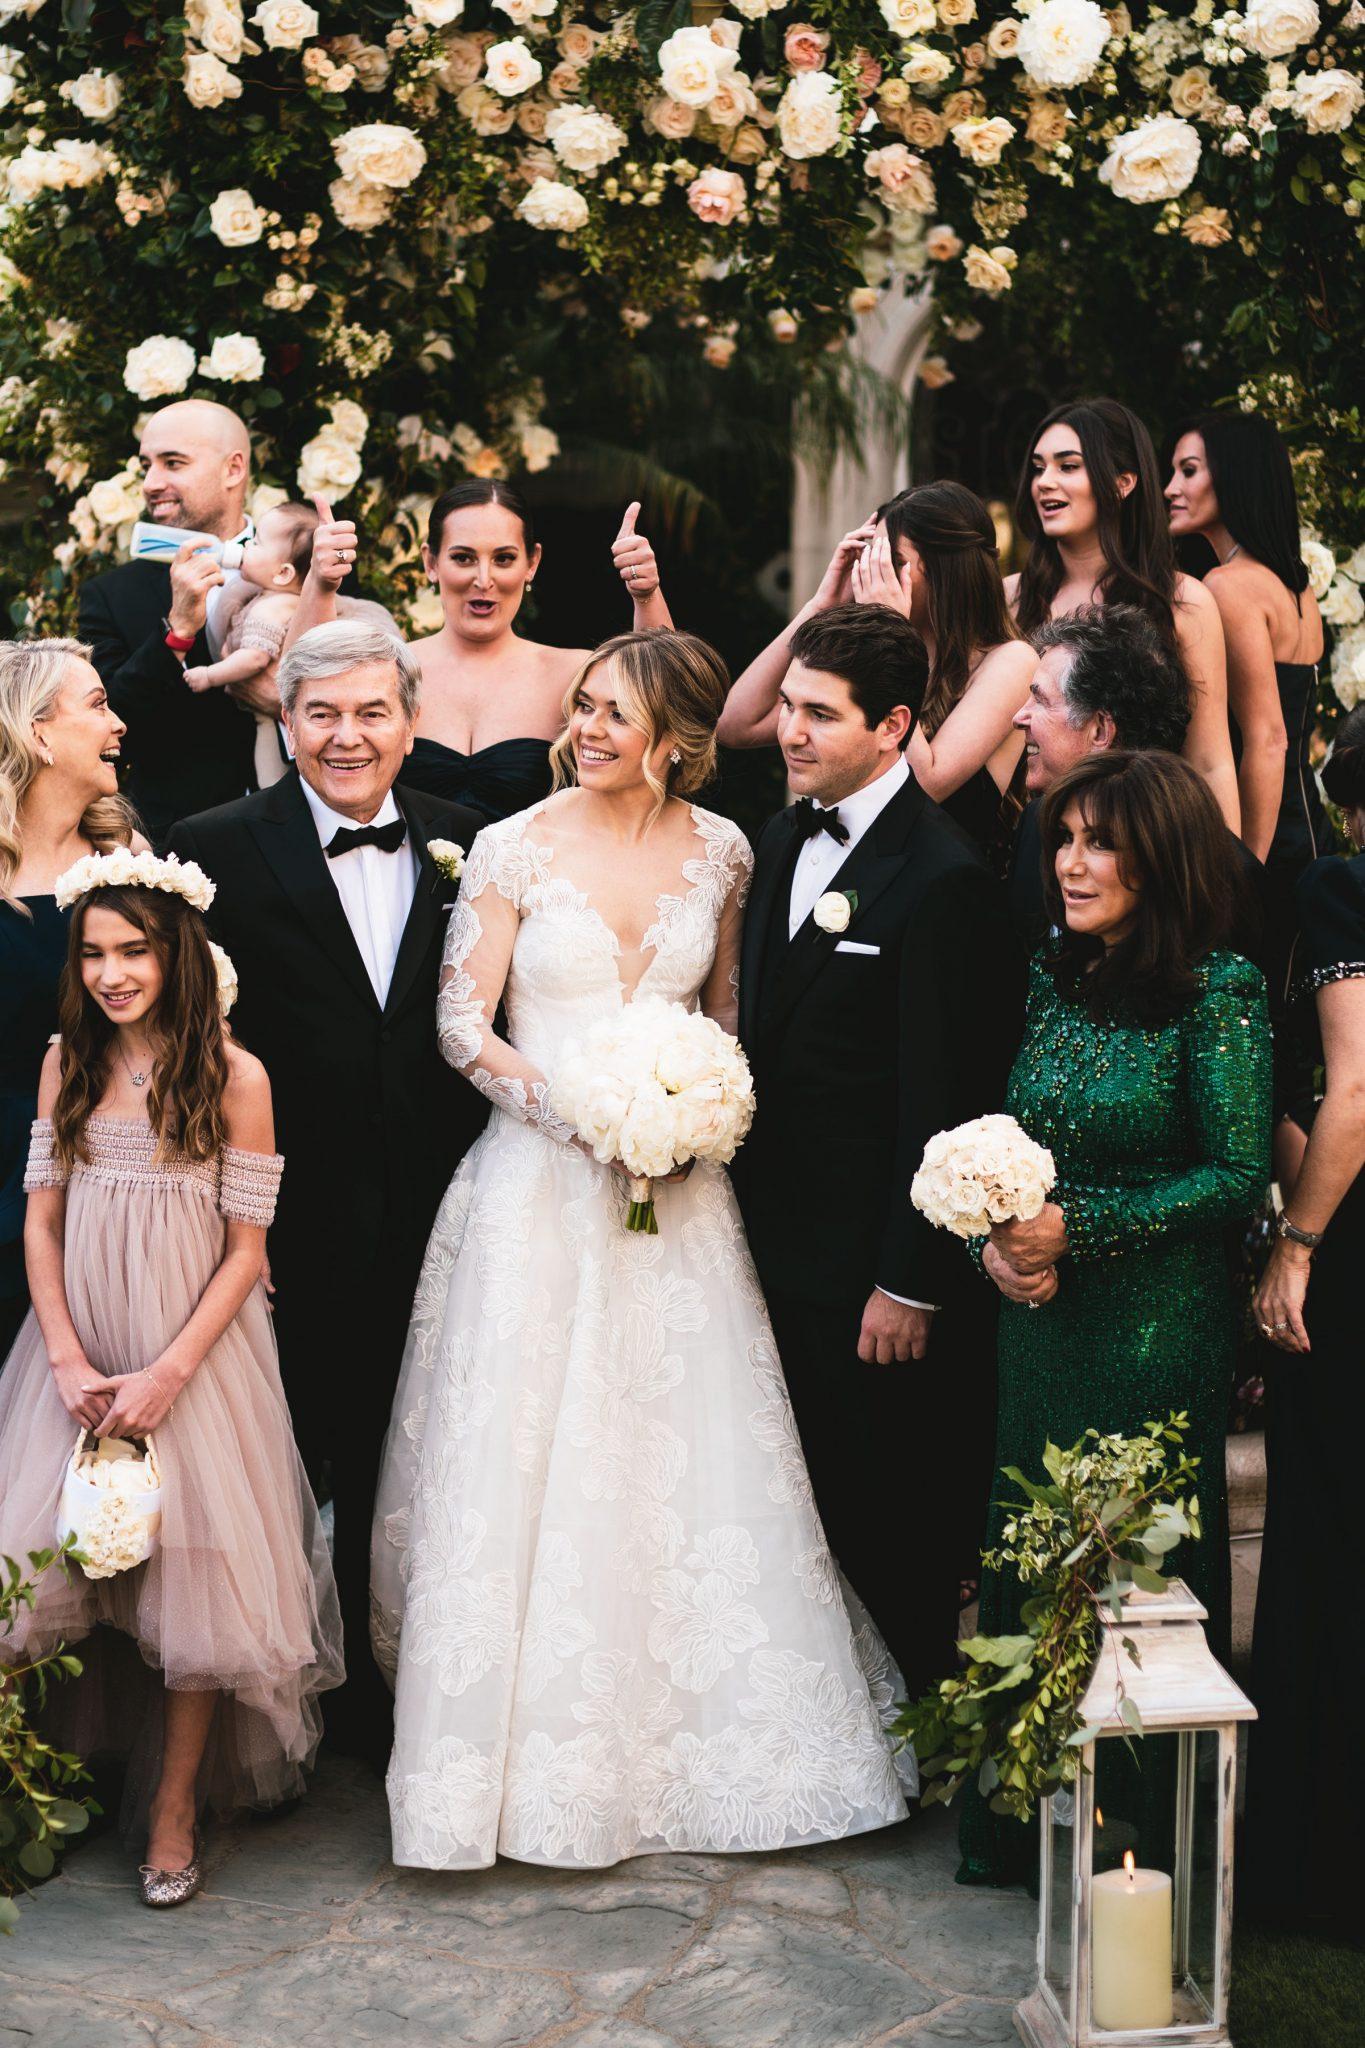 ashley-maxx-beverly-hills-wedding-166